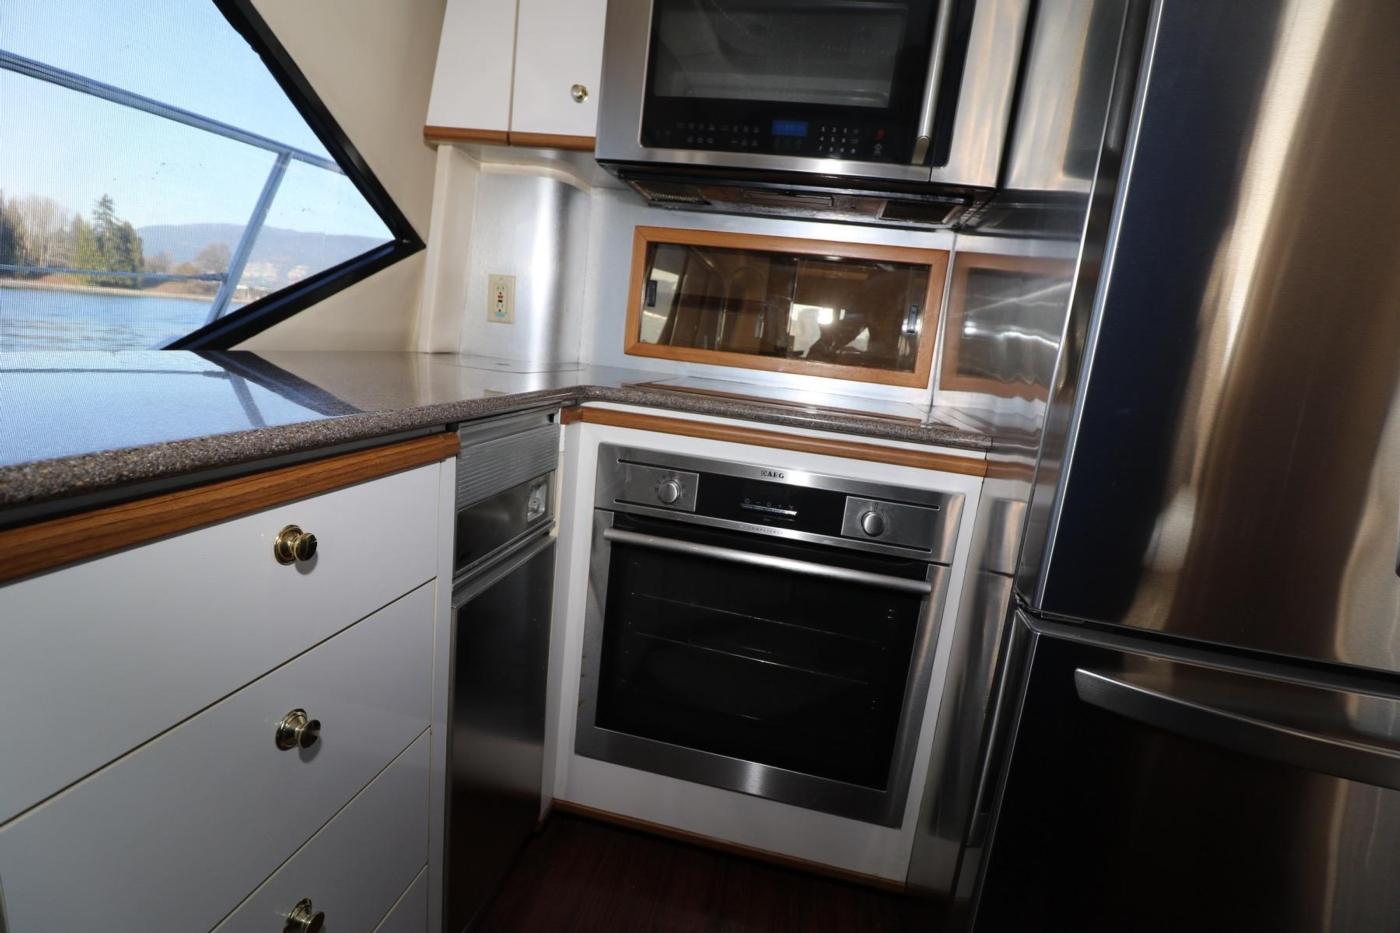 1999 Bayliner 5788 Pilot House Motoryacht, Galley Appliances